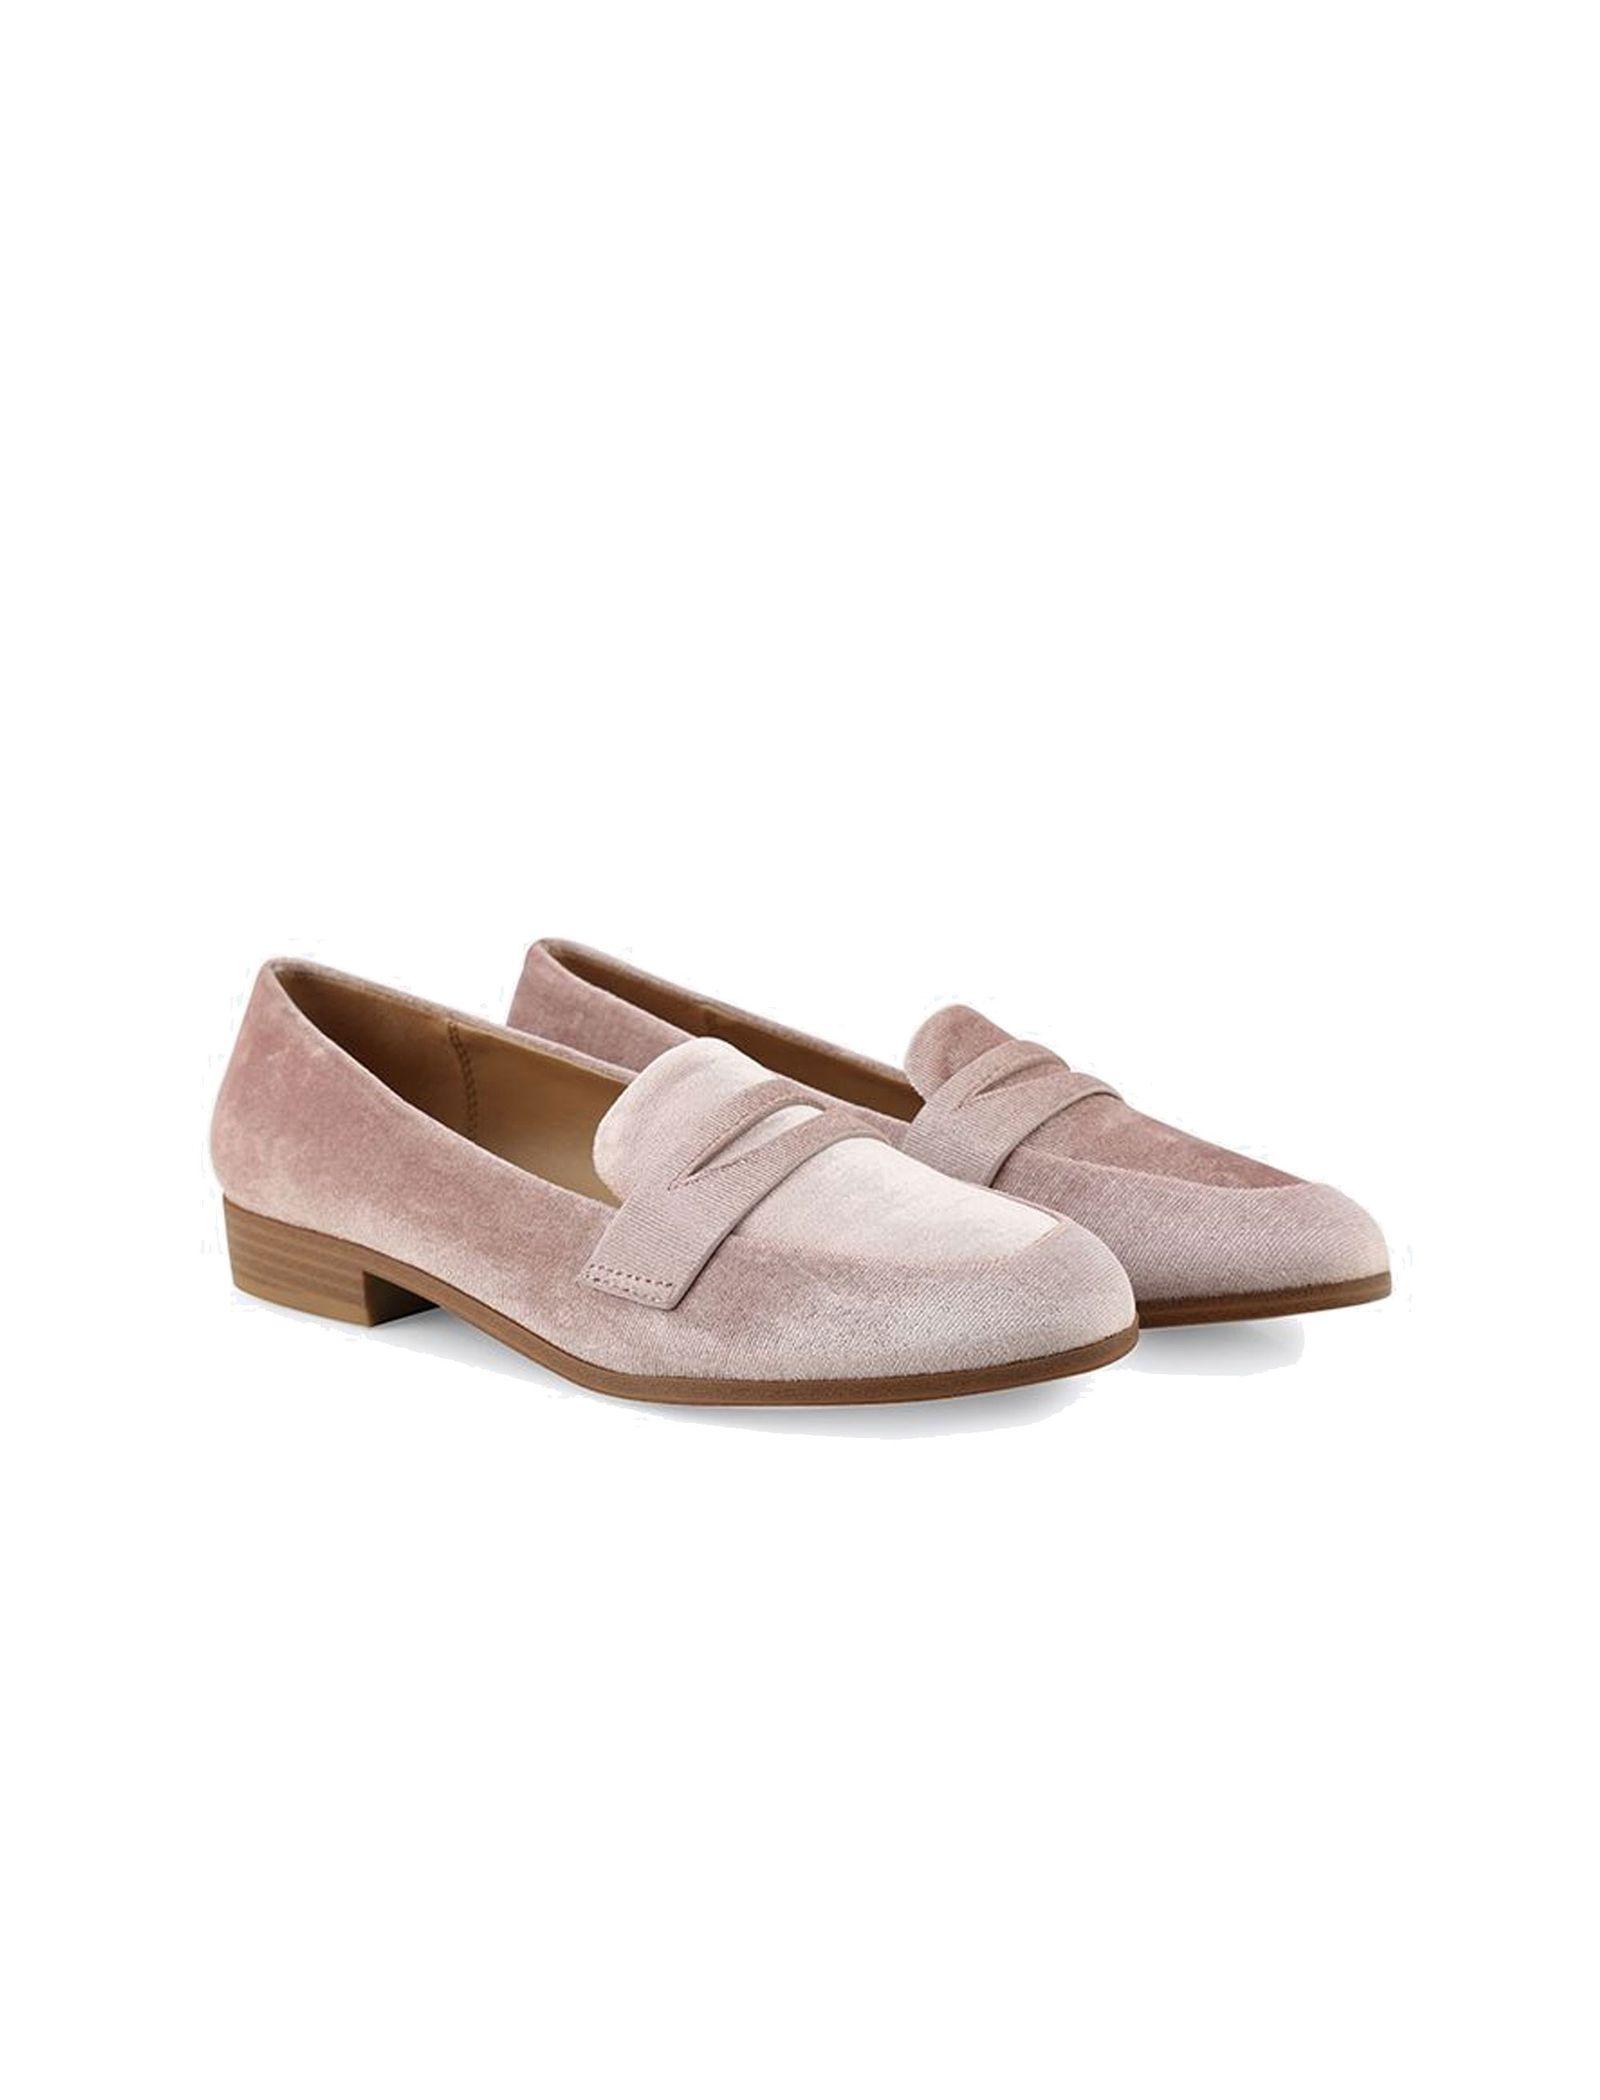 کفش تخت زنانه - کال ایت اسپرینگ - صورتي روشن - 4